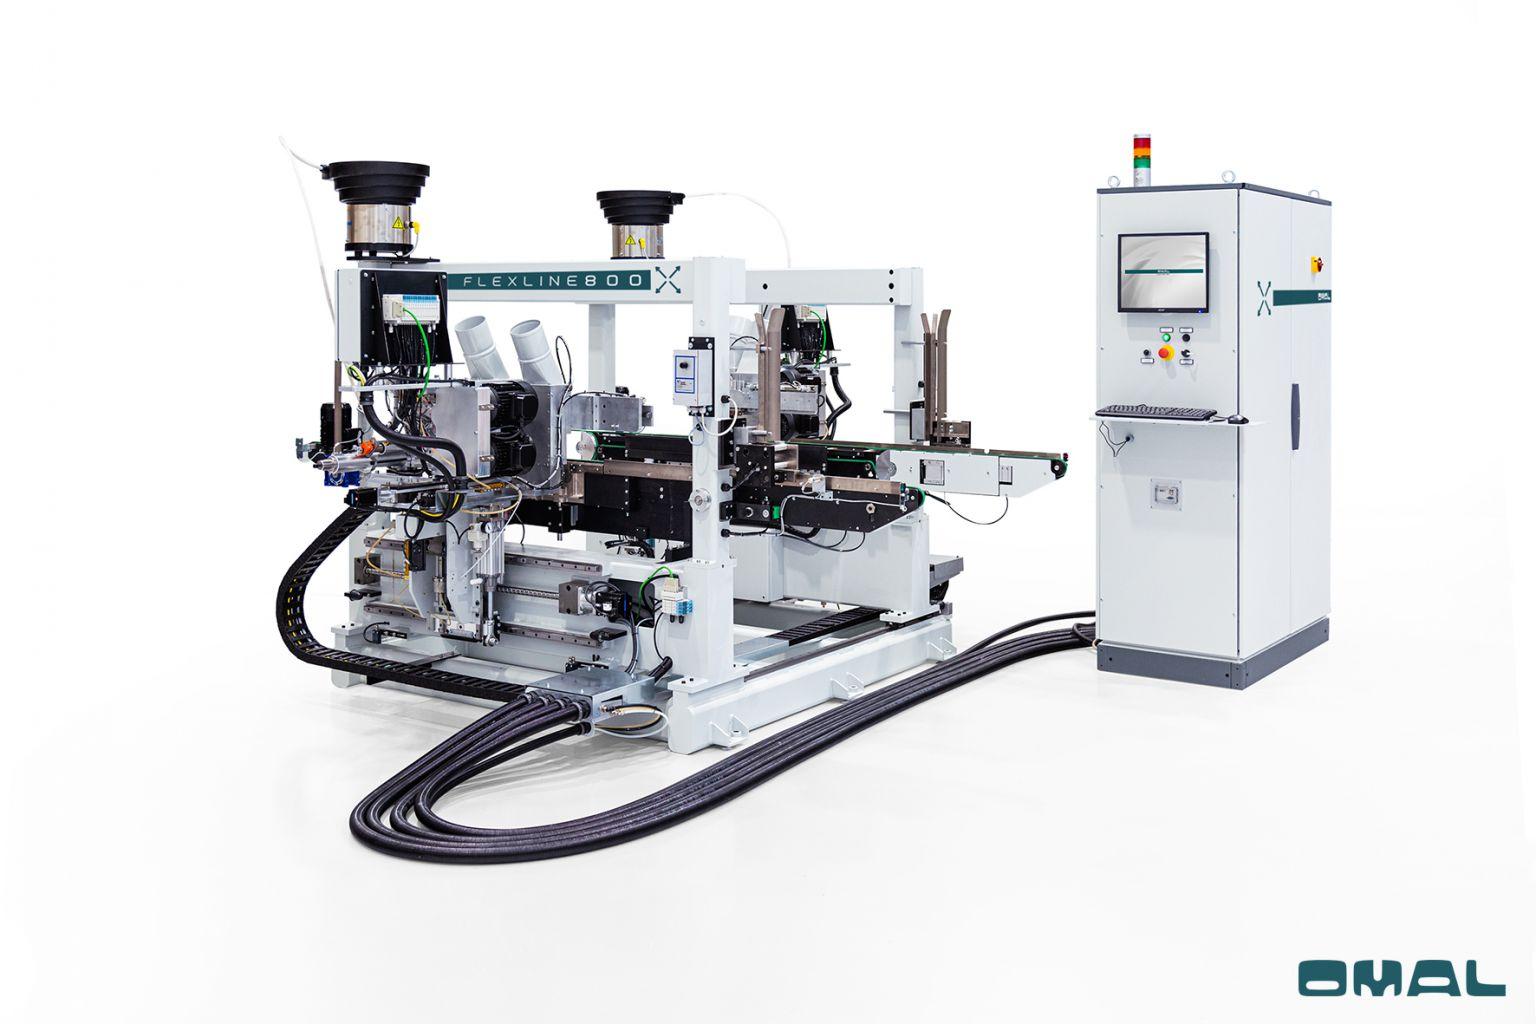 CNC DRILLING MACHINE - FLEXLINE 800